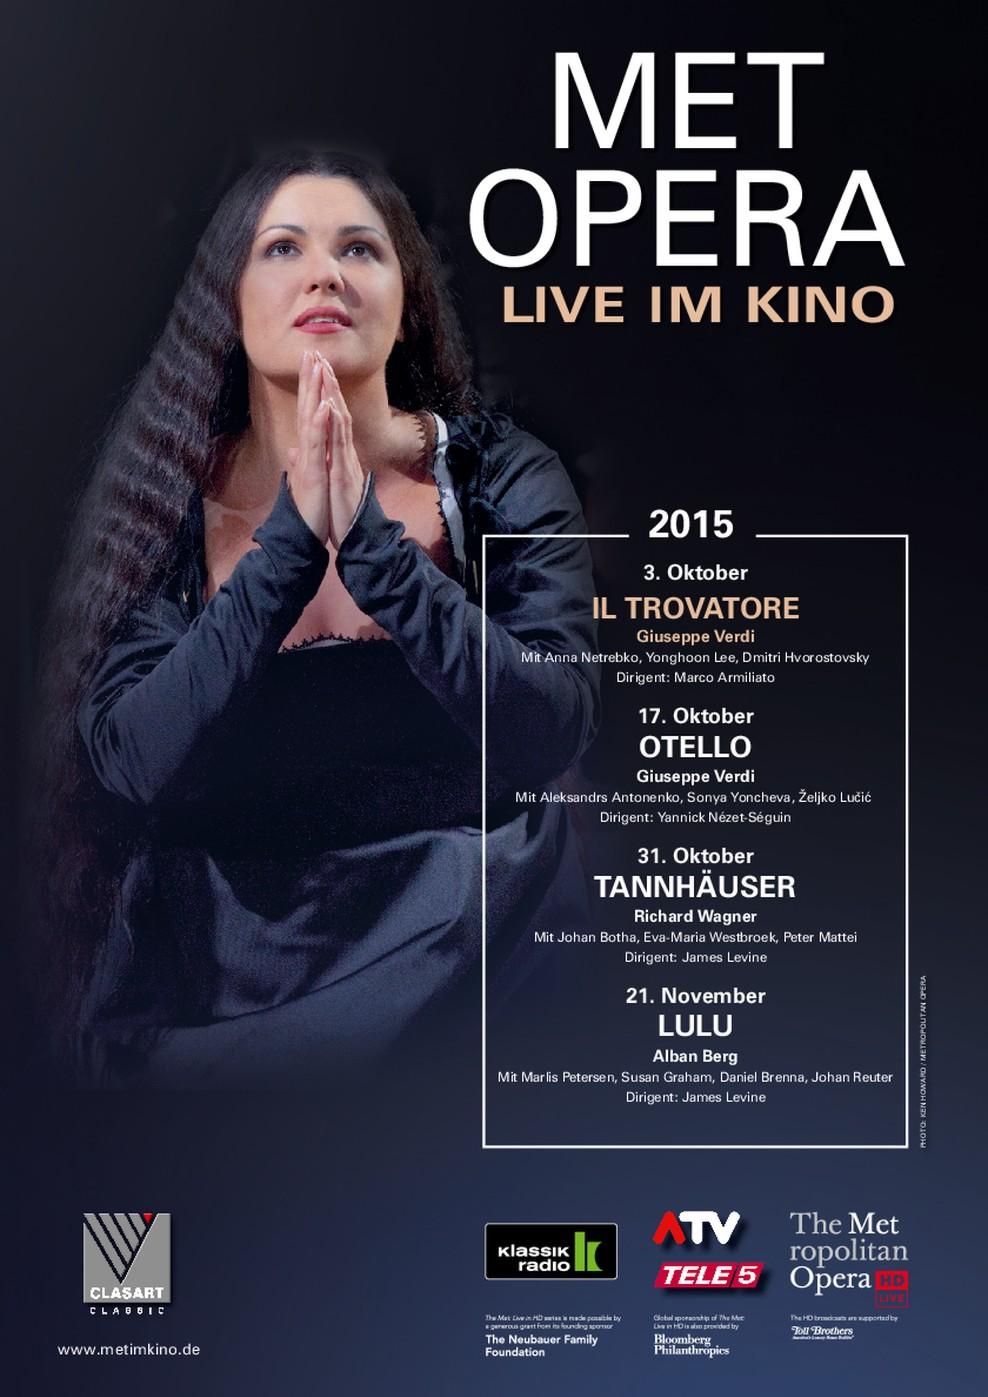 Met Opera 2015/16: Il Trovatore (Verdi) (Poster)